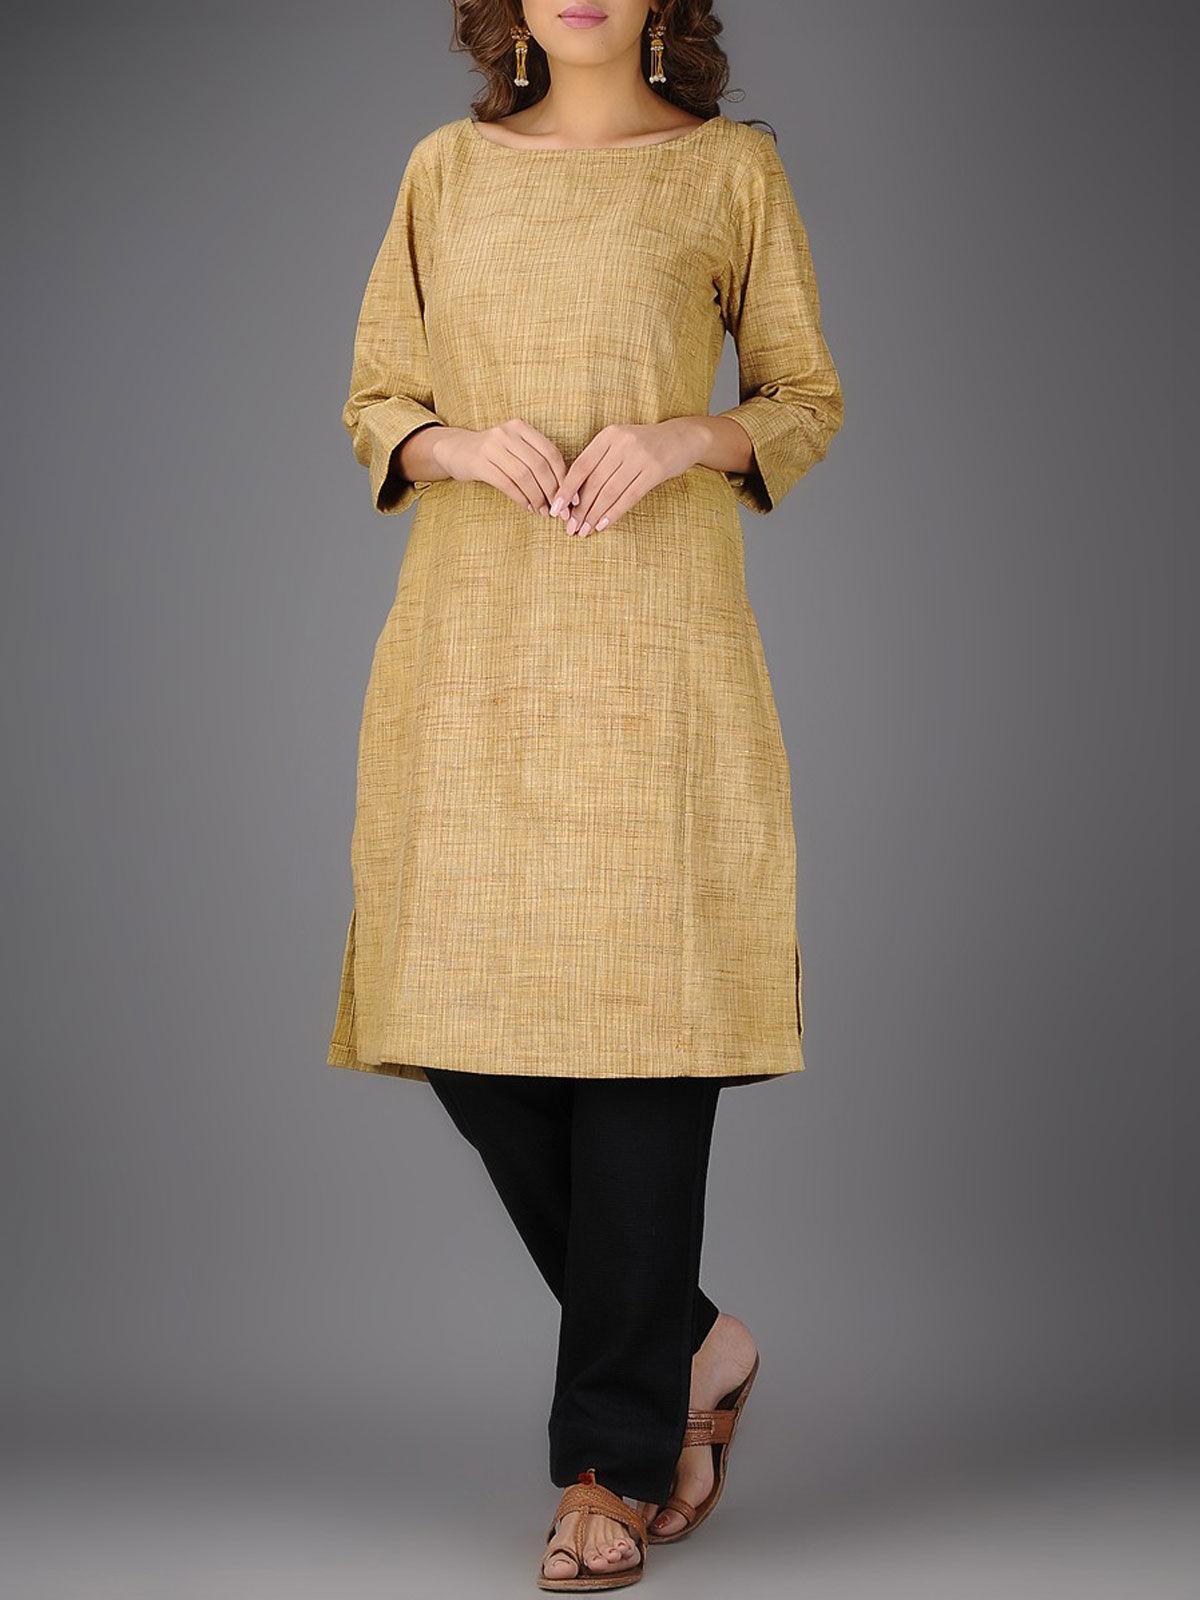 Matka silk kurta with stitch details